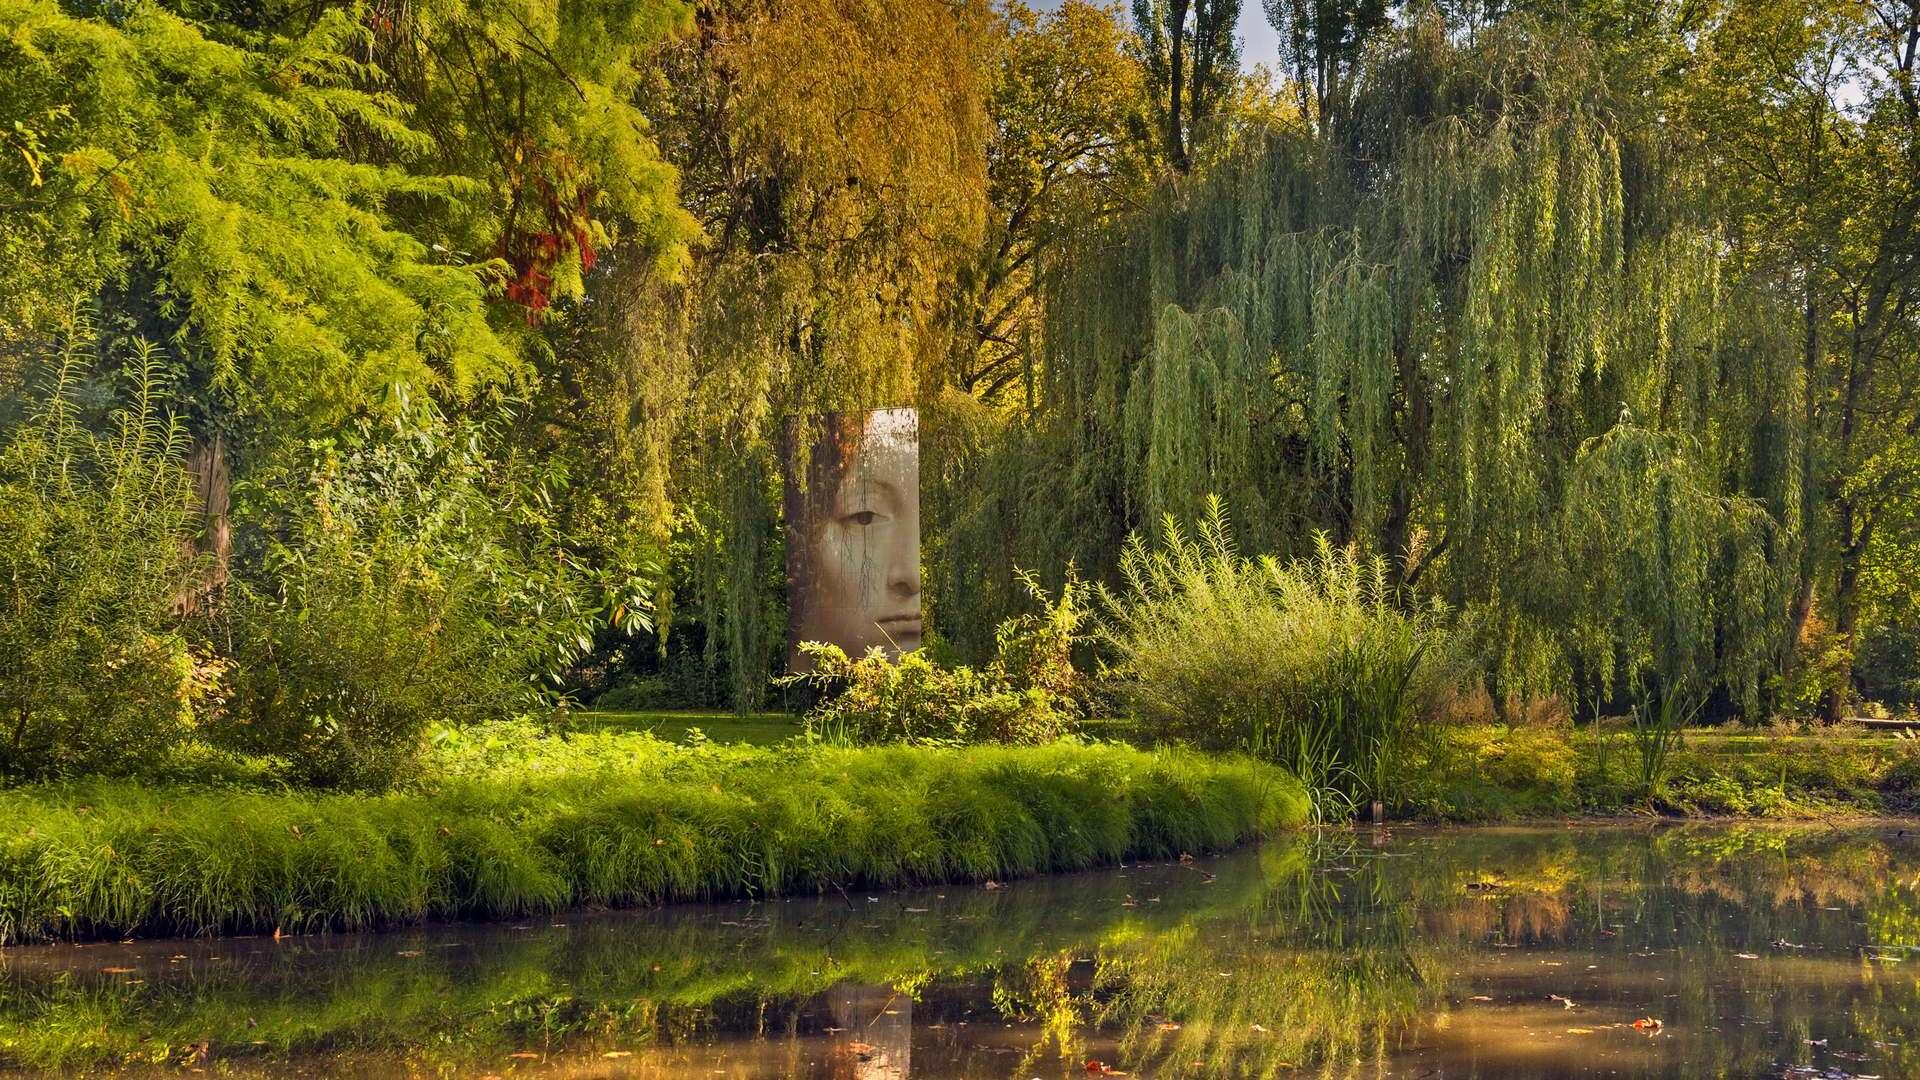 Schloss clos luc das naturgenie leonardo da vinci das loiretal ein ausflug nach frankreich - Jardin du clos des blancs manteaux ...